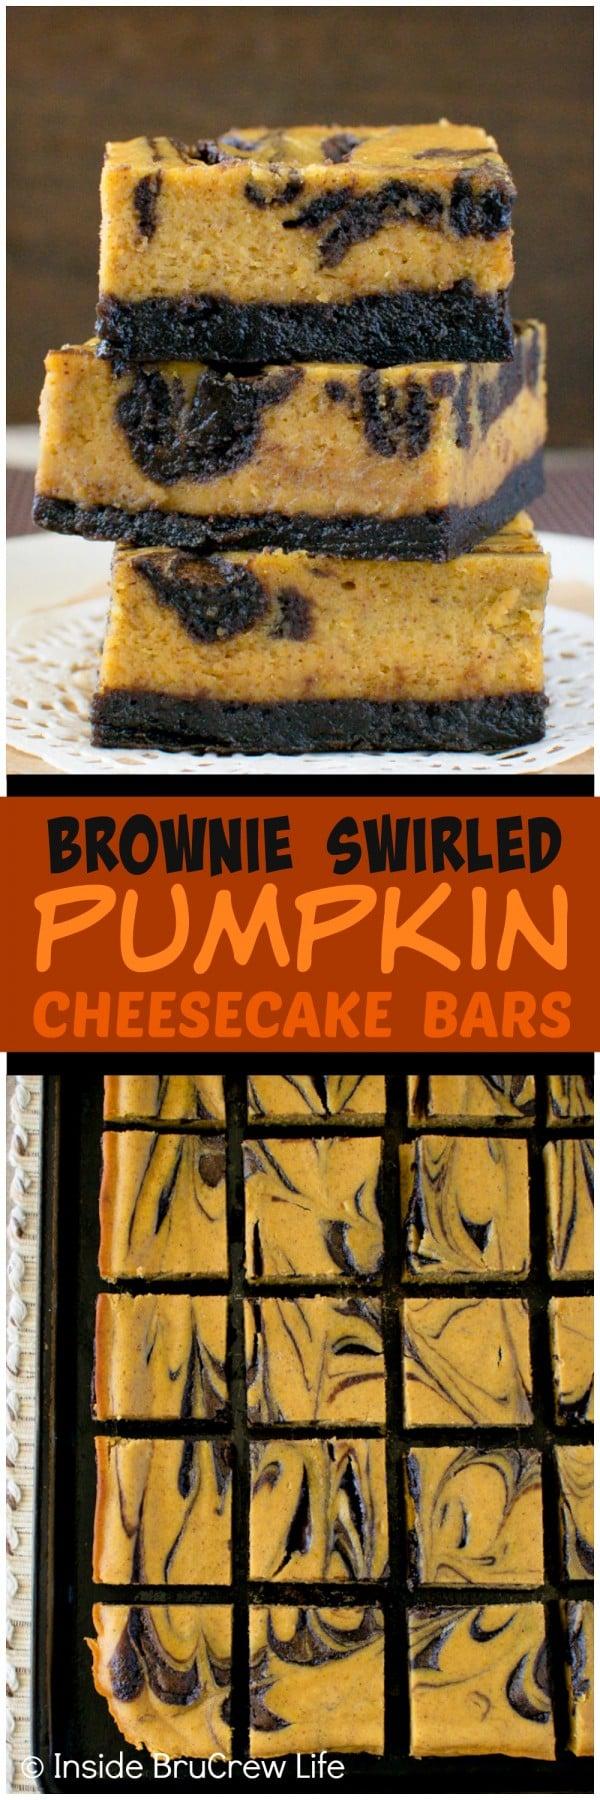 Brownie Swirled Pumpkin Cheesecake Bars - creamy pumpkin cheesecake with chocolate crust and swirls on top. Great fall dessert recipe!